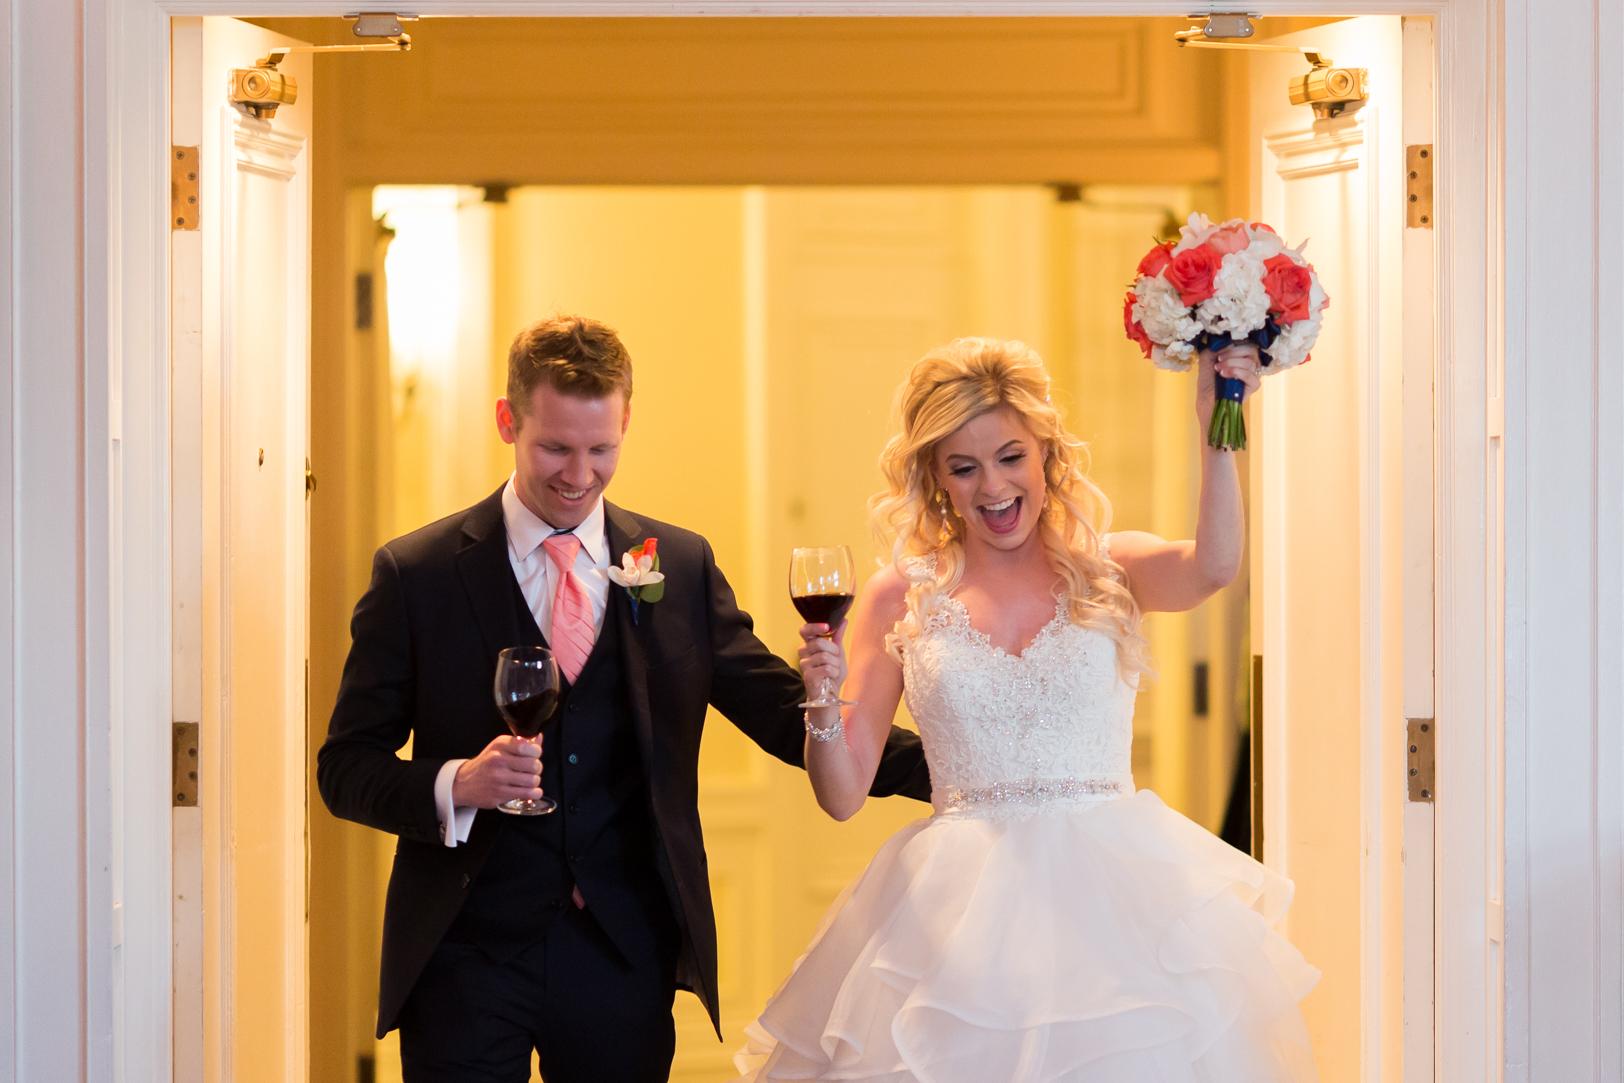 hotel macdonald wedding cathy amp fraser deep blue